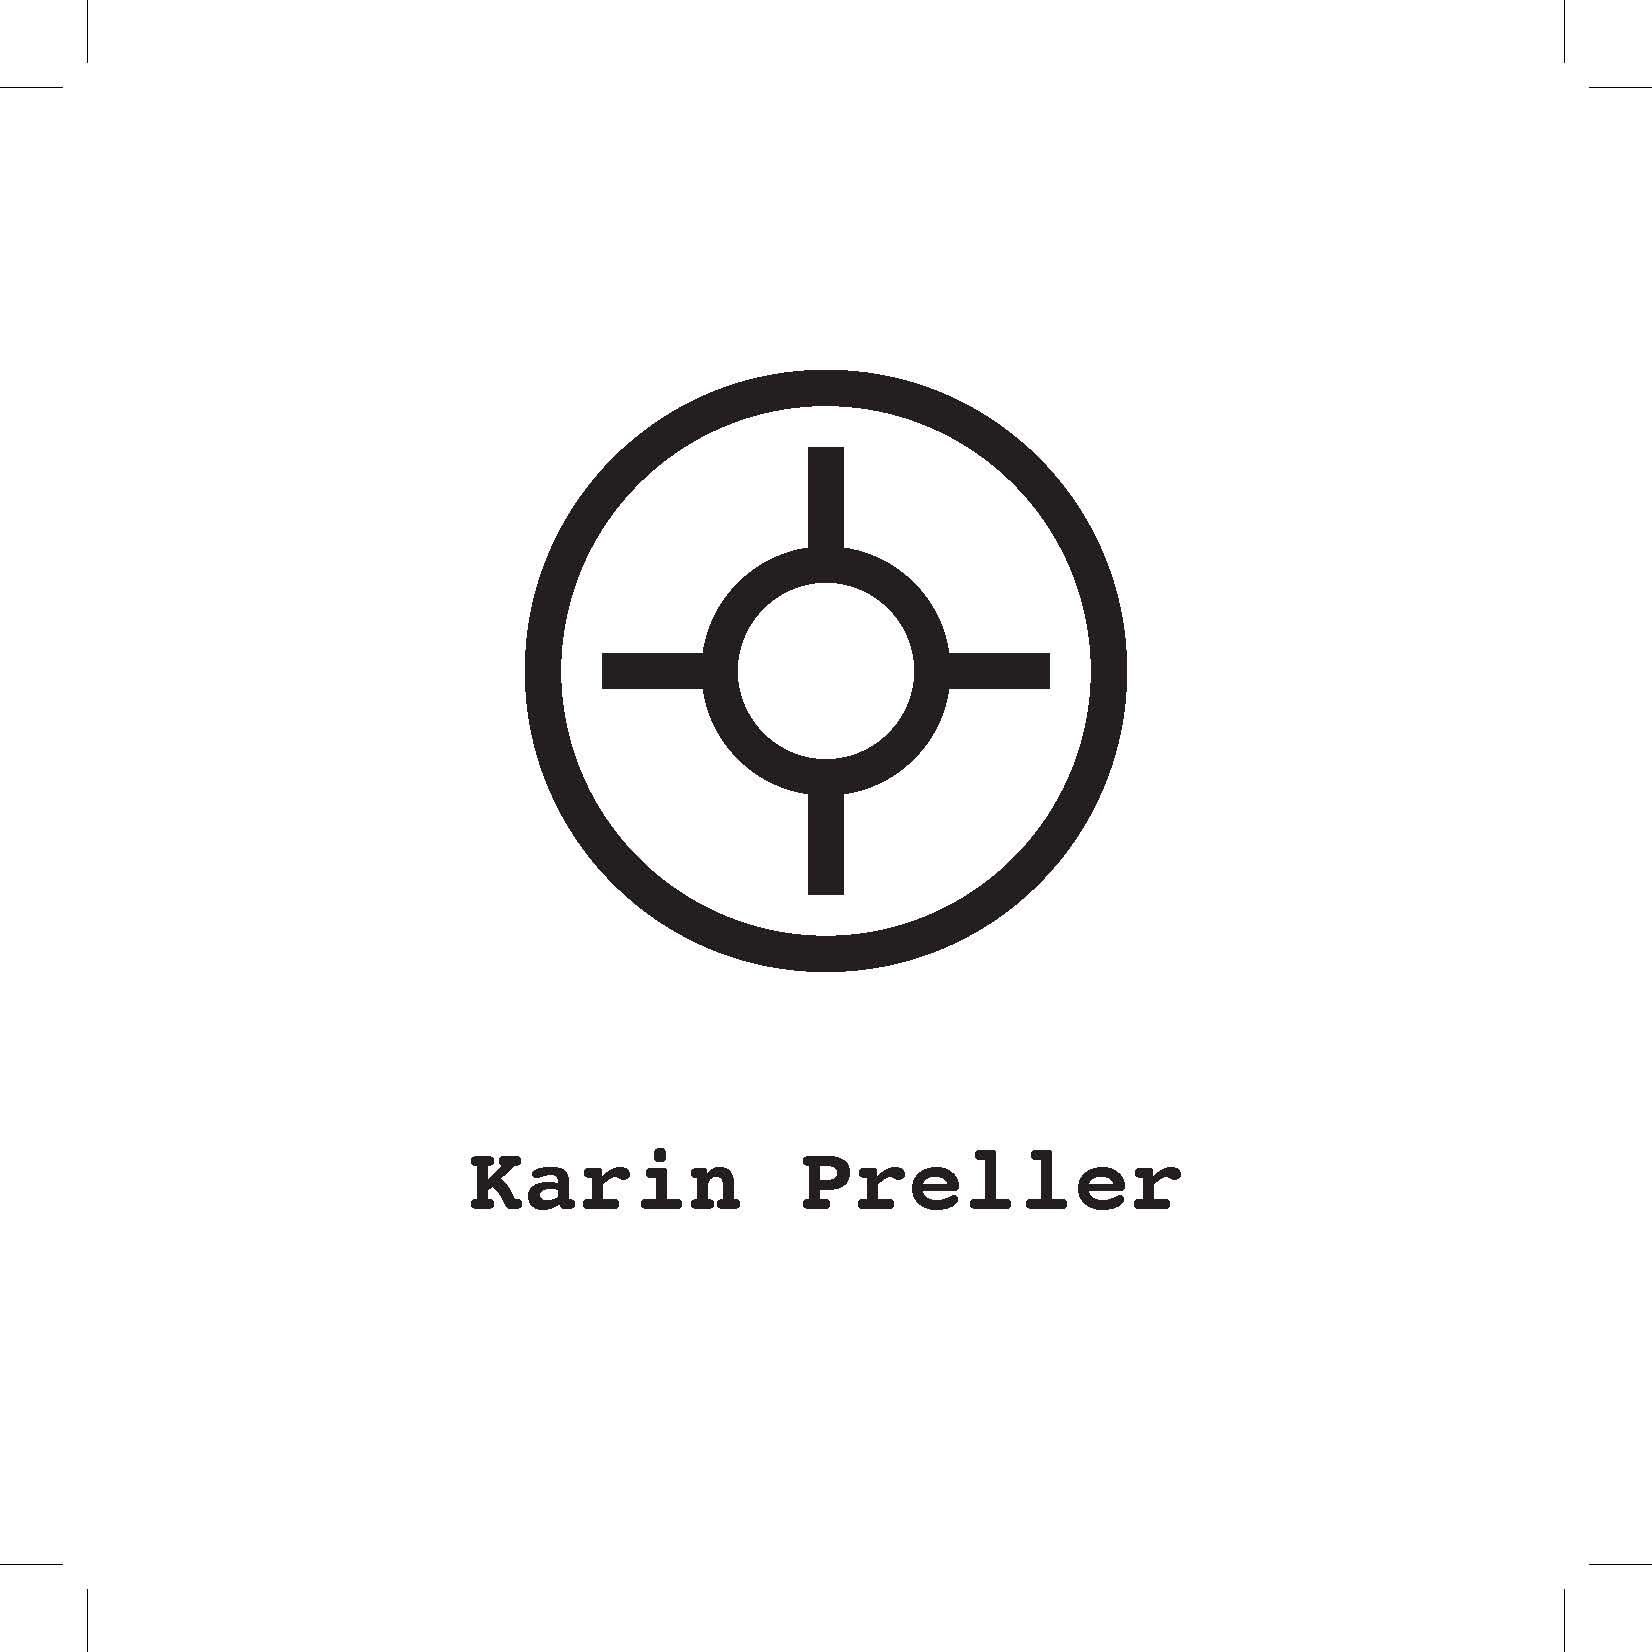 MAP Southafrica - Karin Preller